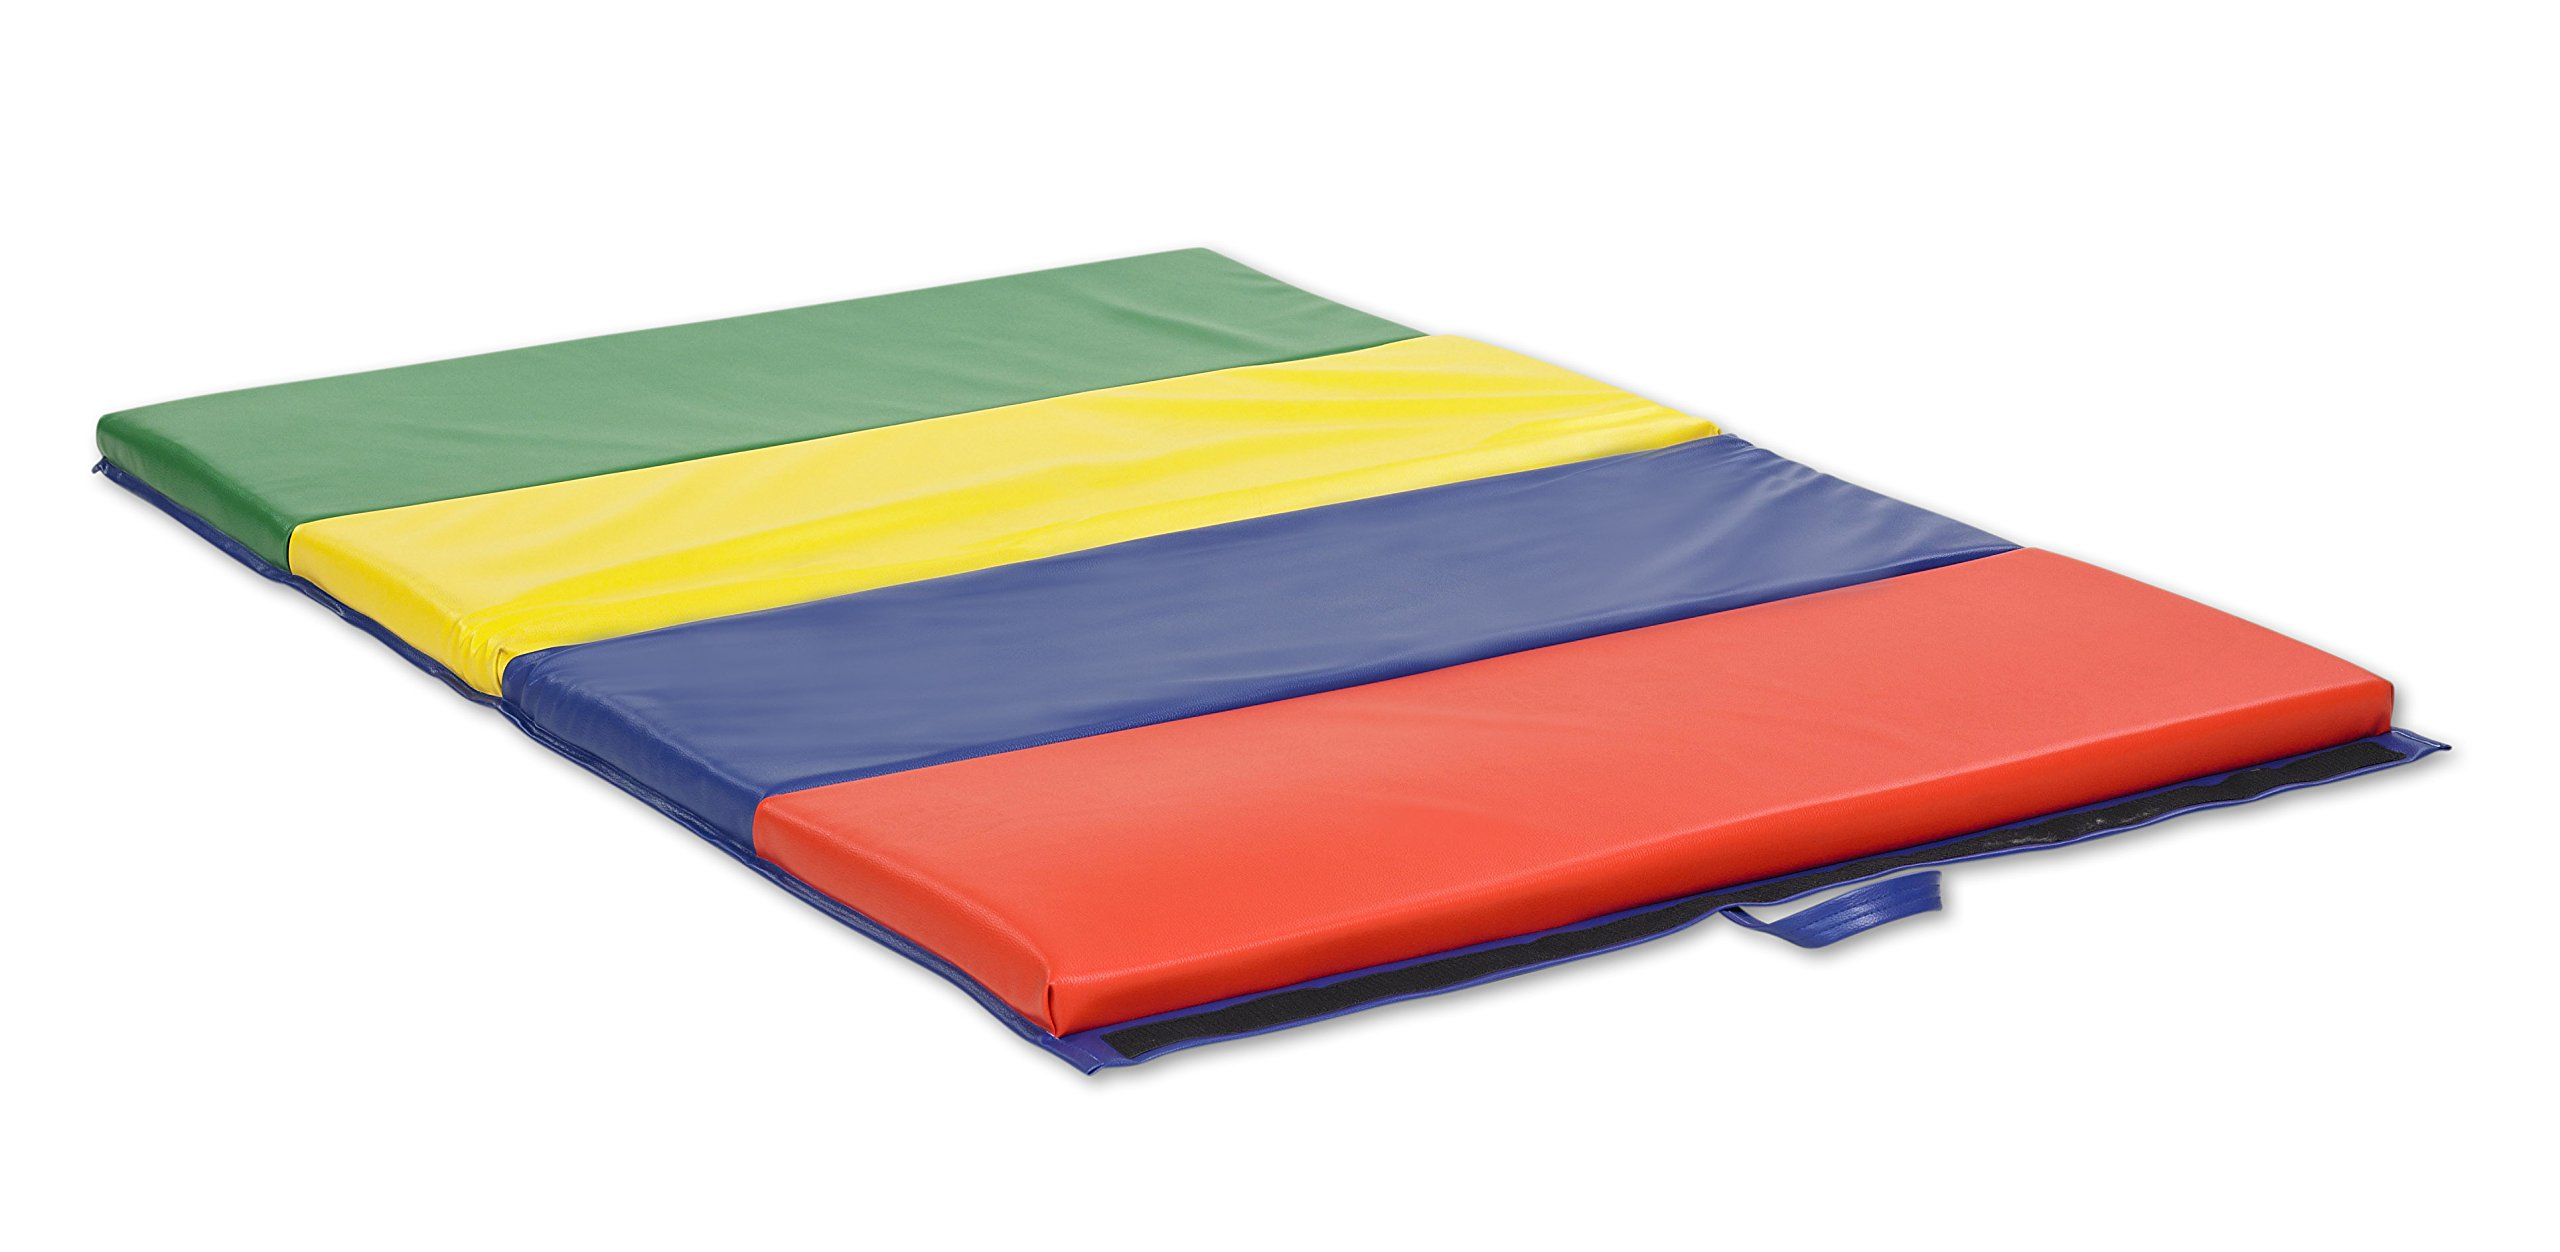 mats best daycare nap sleeping kindergarten kids home for preschool and